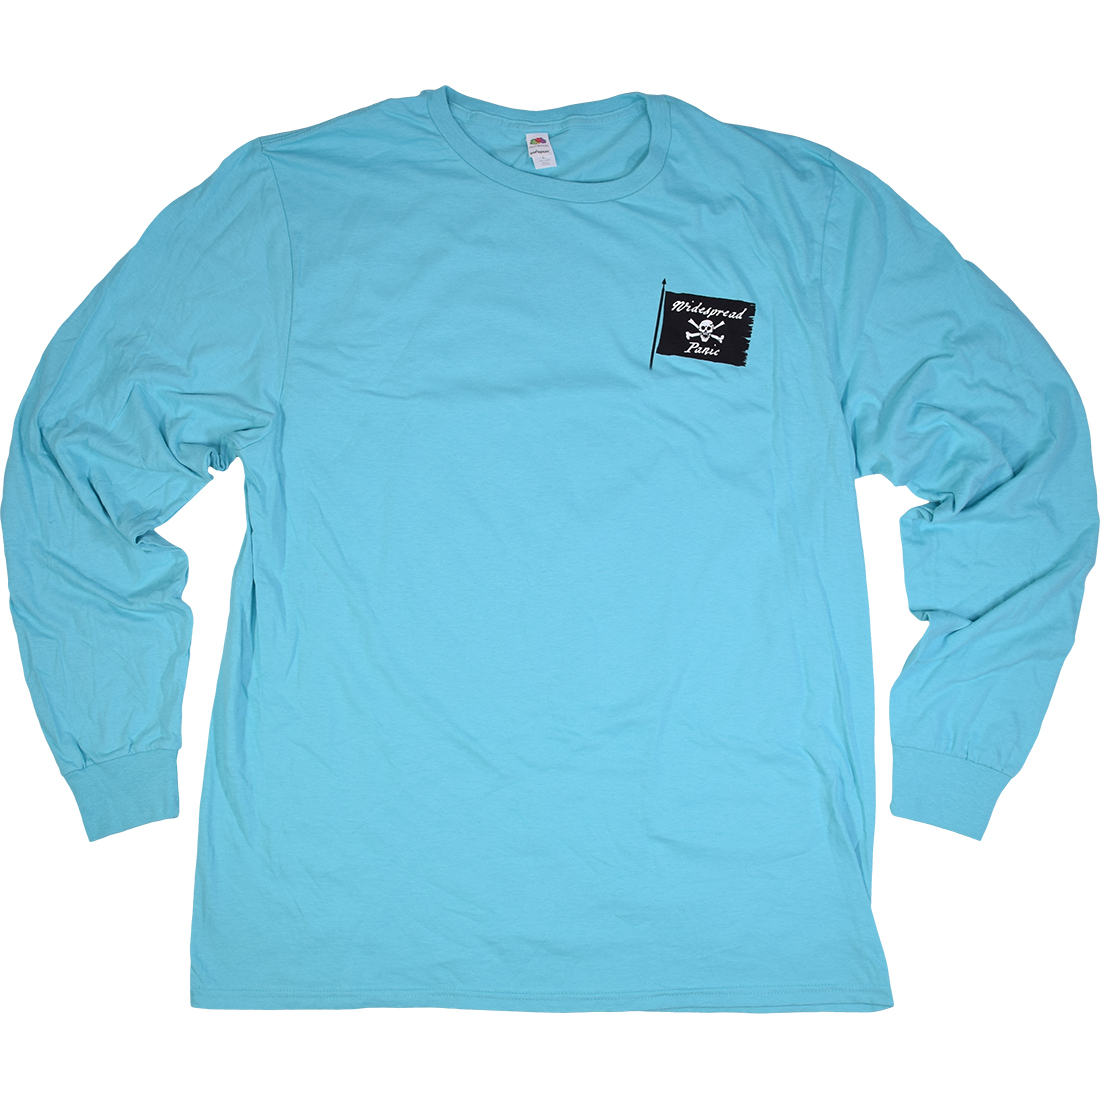 Widespread St. Augustine Light Blue Long Sleeve T-Shirt